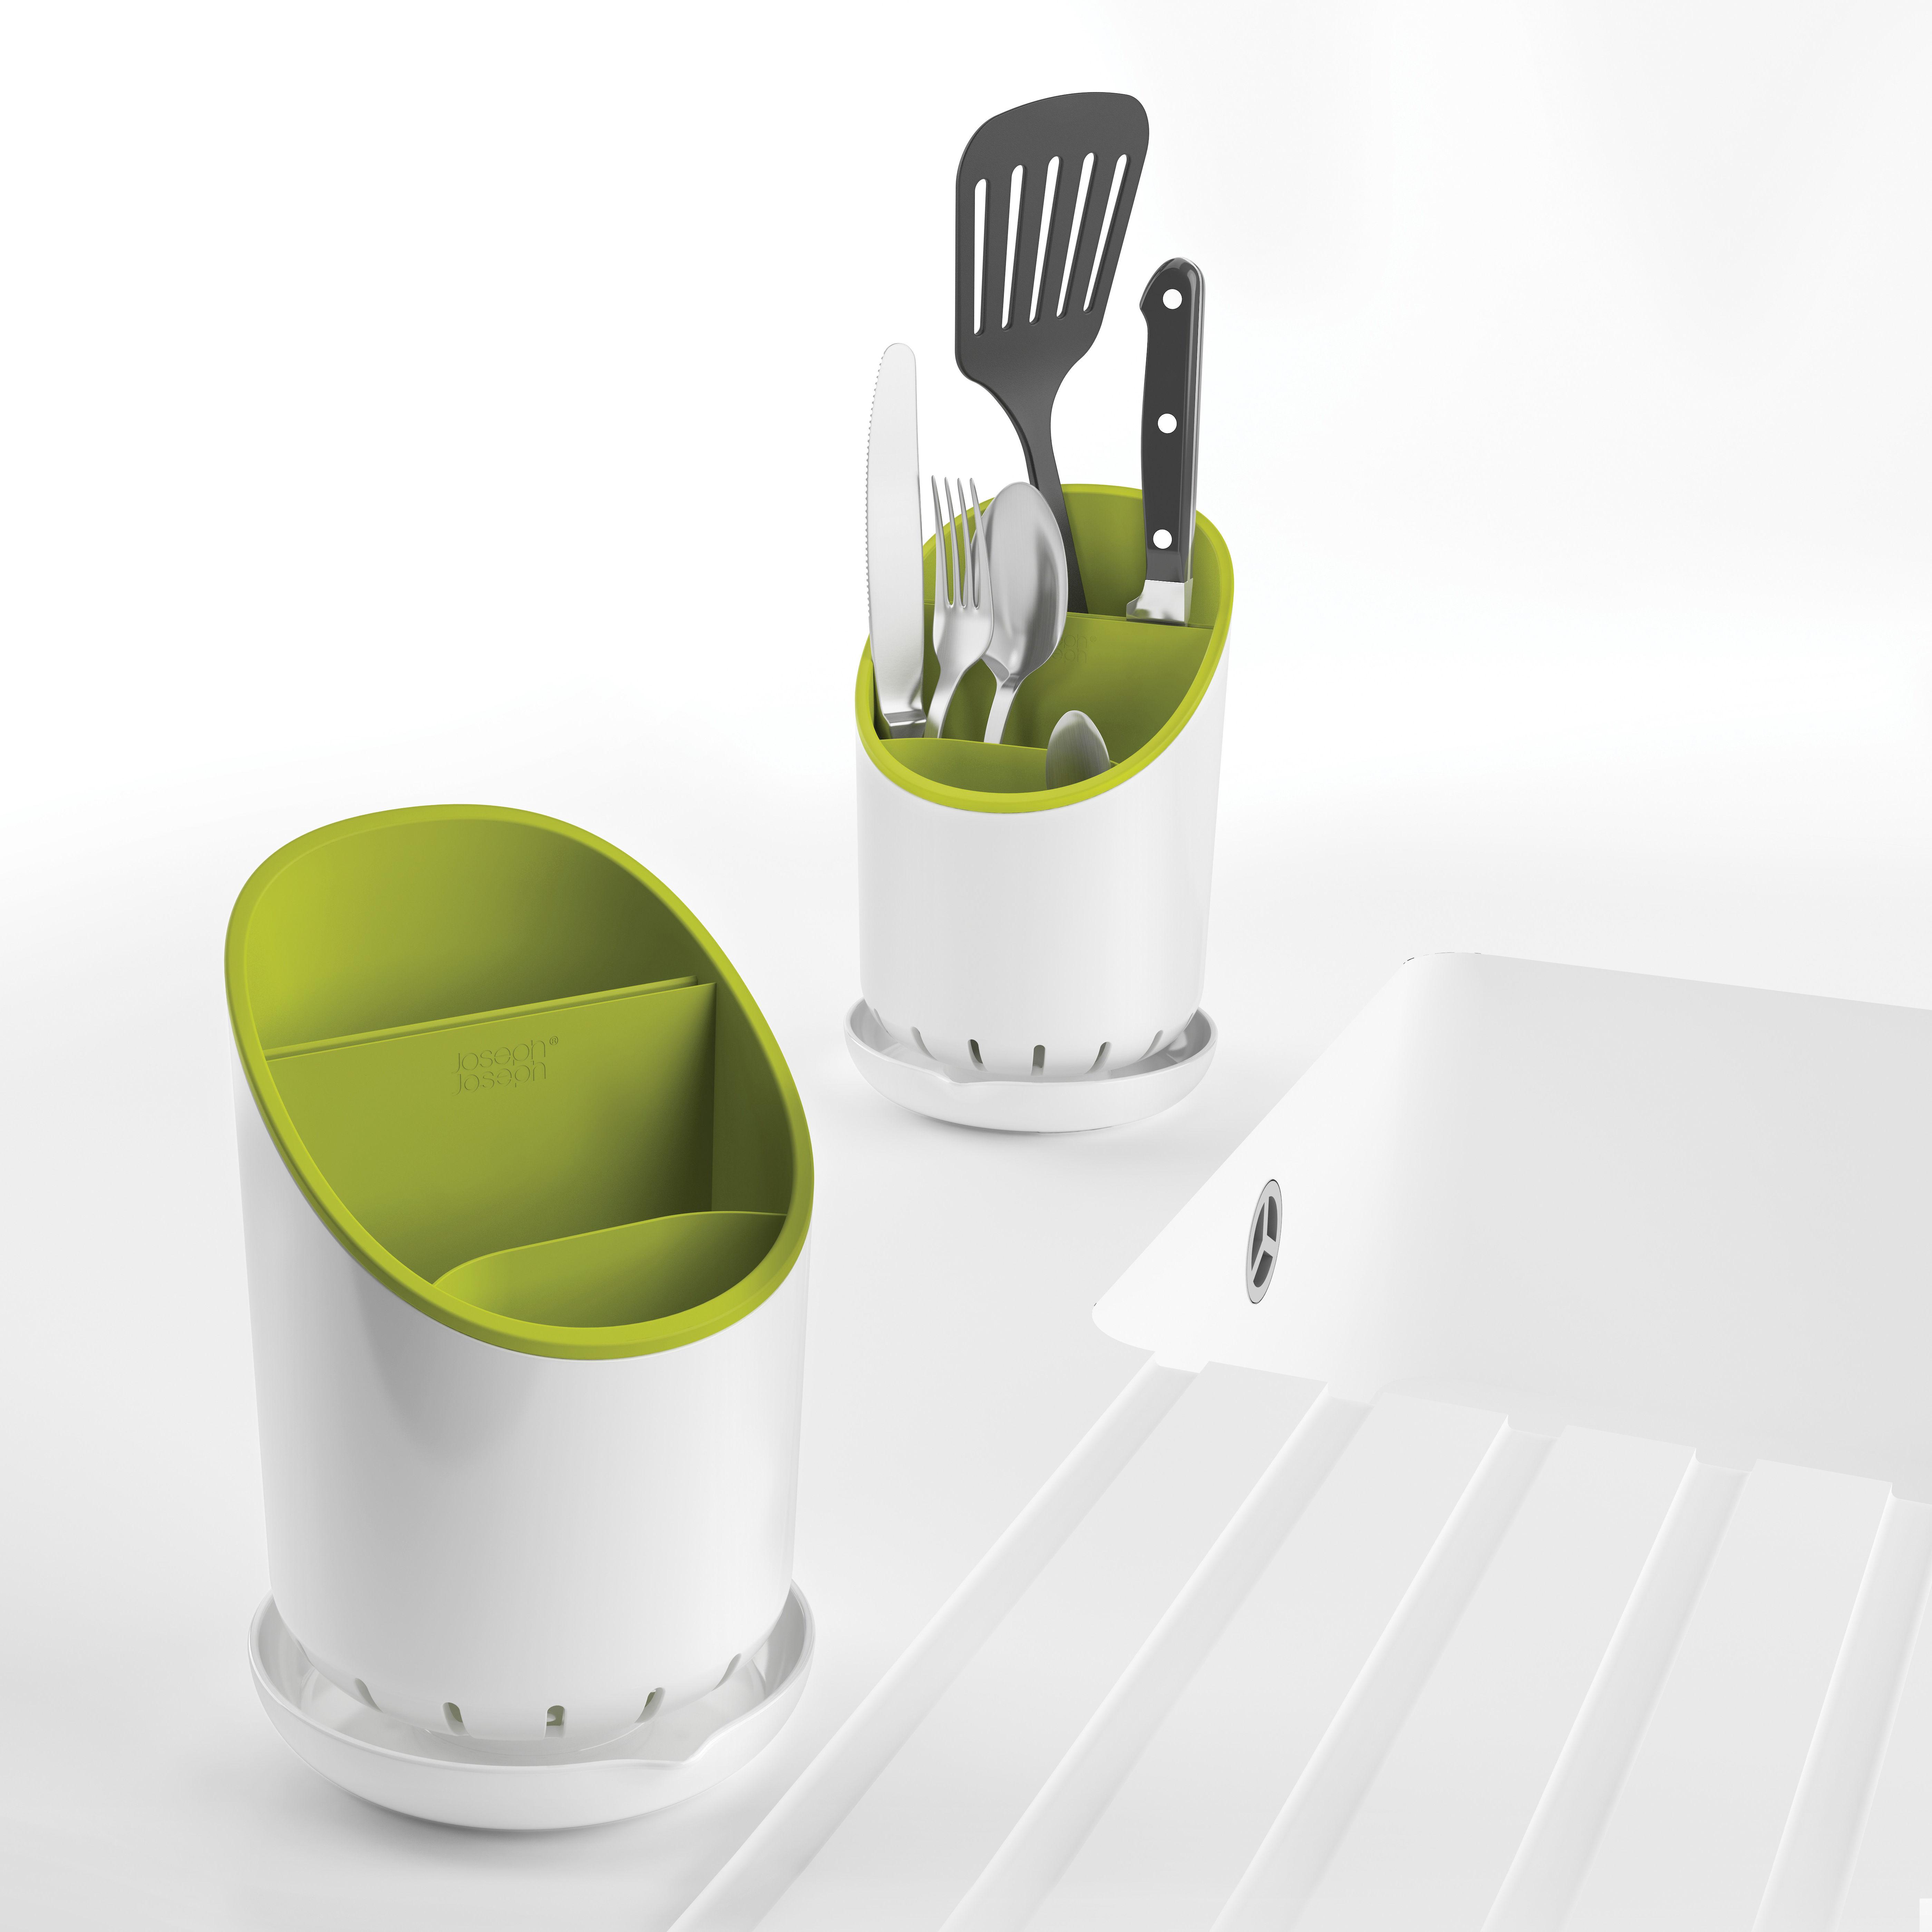 dock f r besteck und k chenutensilien joseph joseph abtropfgestell. Black Bedroom Furniture Sets. Home Design Ideas